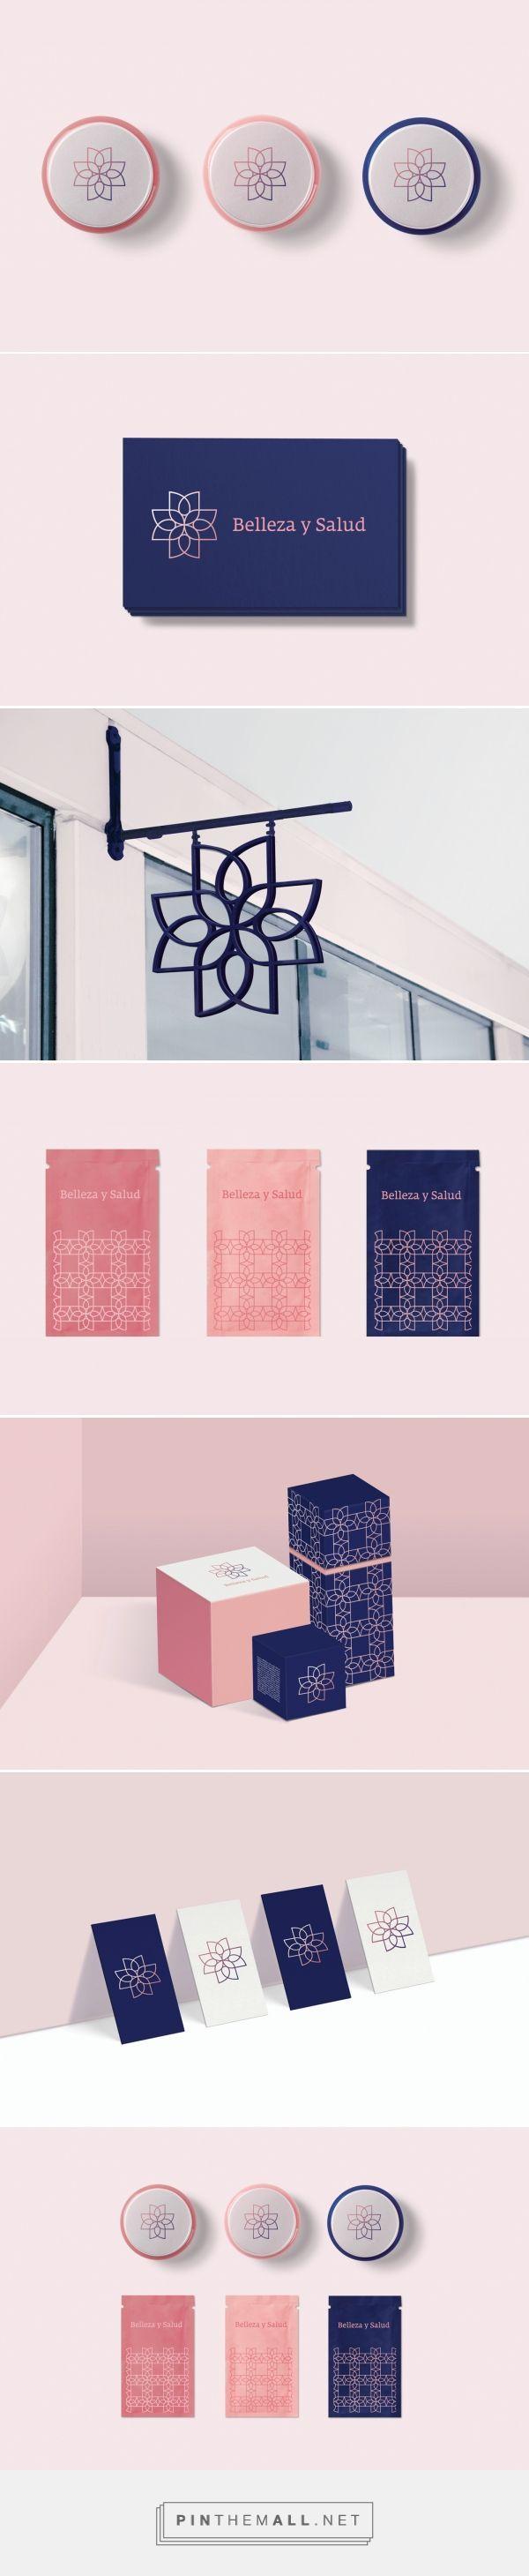 Belleza Y Salud by Maria Hdez on Behance | Fivestar Branding – Design and Branding Agency & Inspiration Gallery